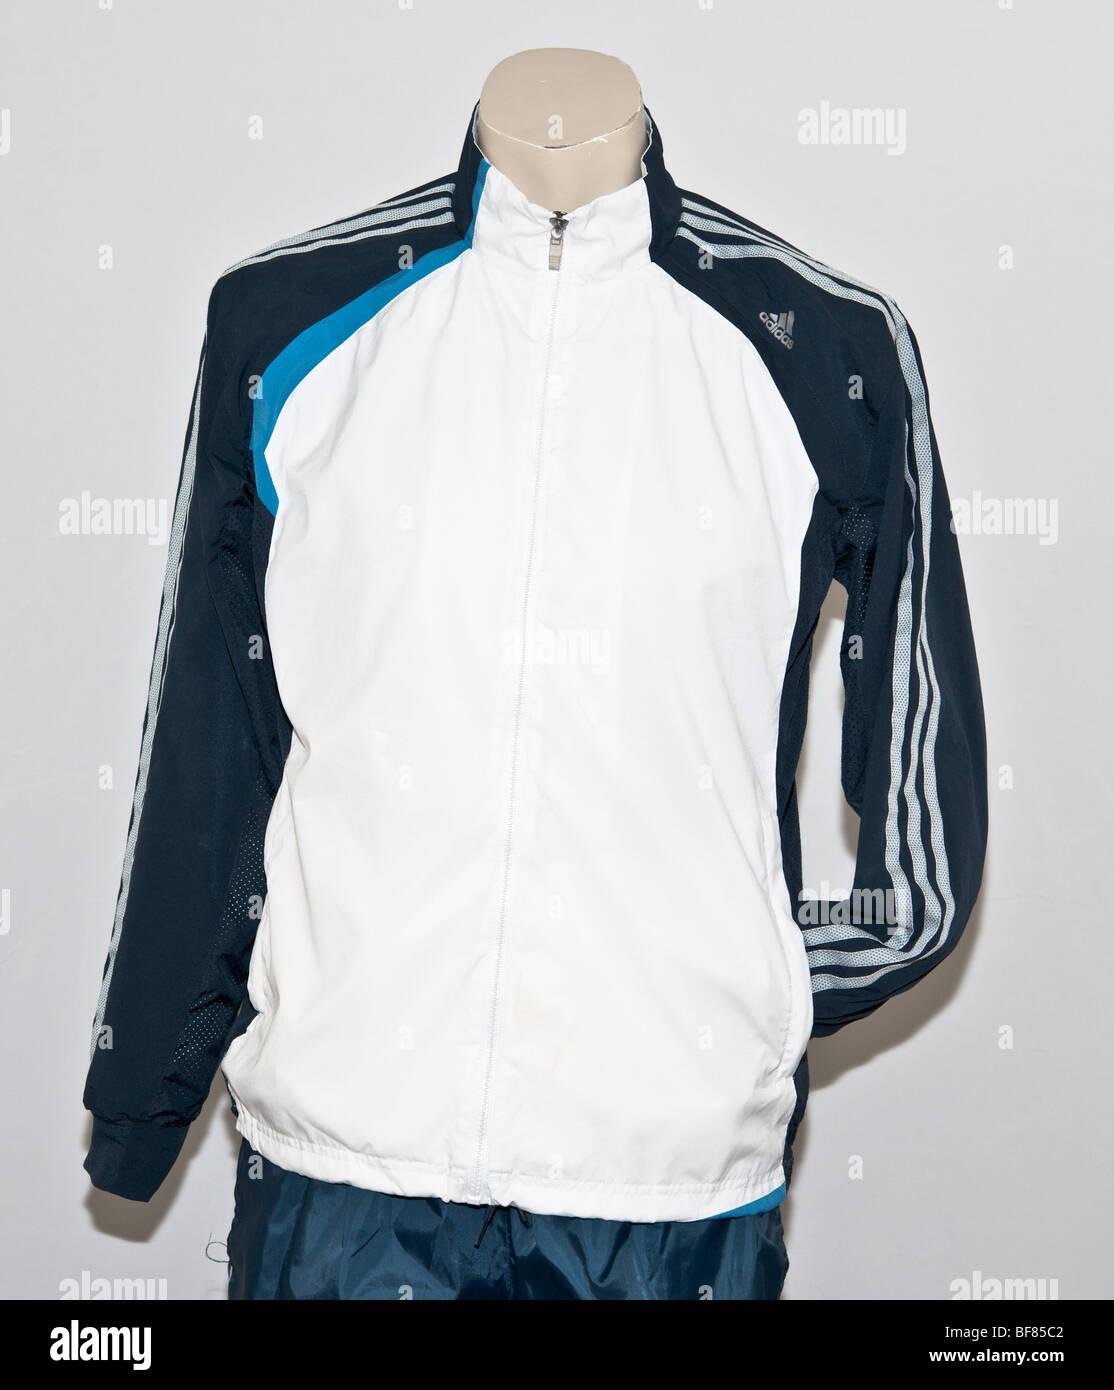 Adidas Trainingsanzug Jacke. adidas Logo drei weiße Streifen, die Arme. ca1c5e112d